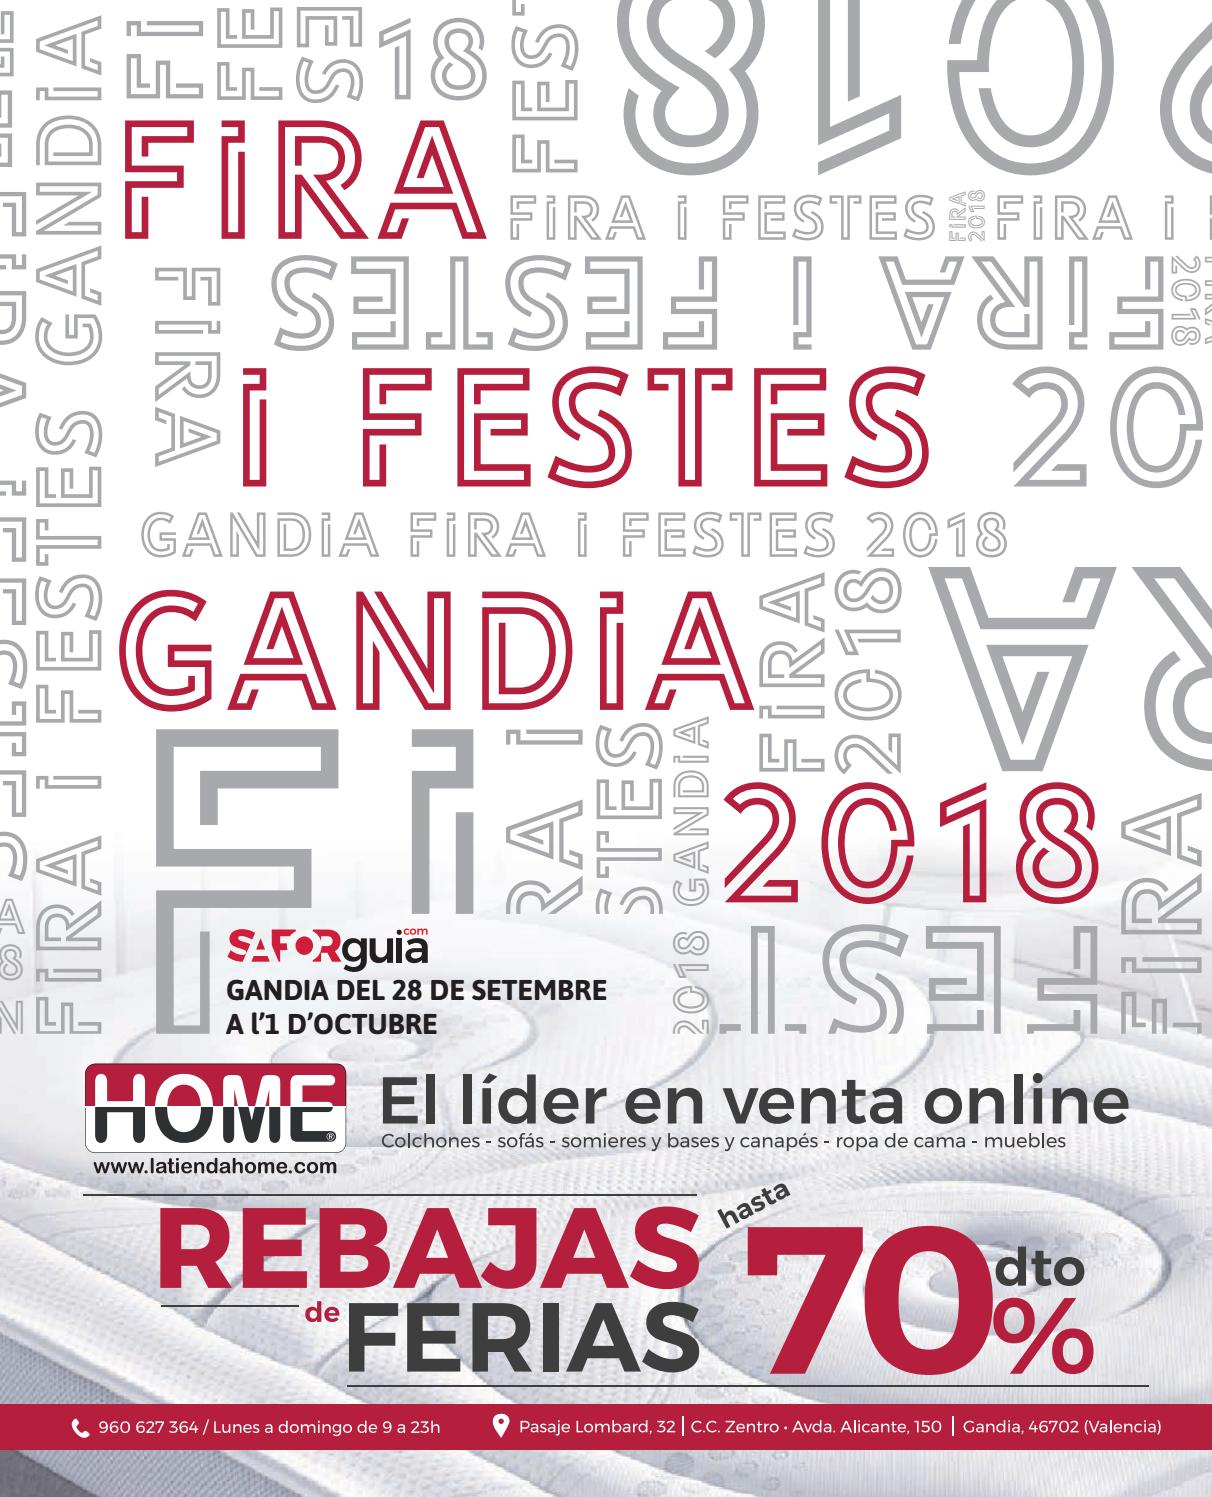 Fira i Festes 2018 by Saforguia MediaServiocio - issuu